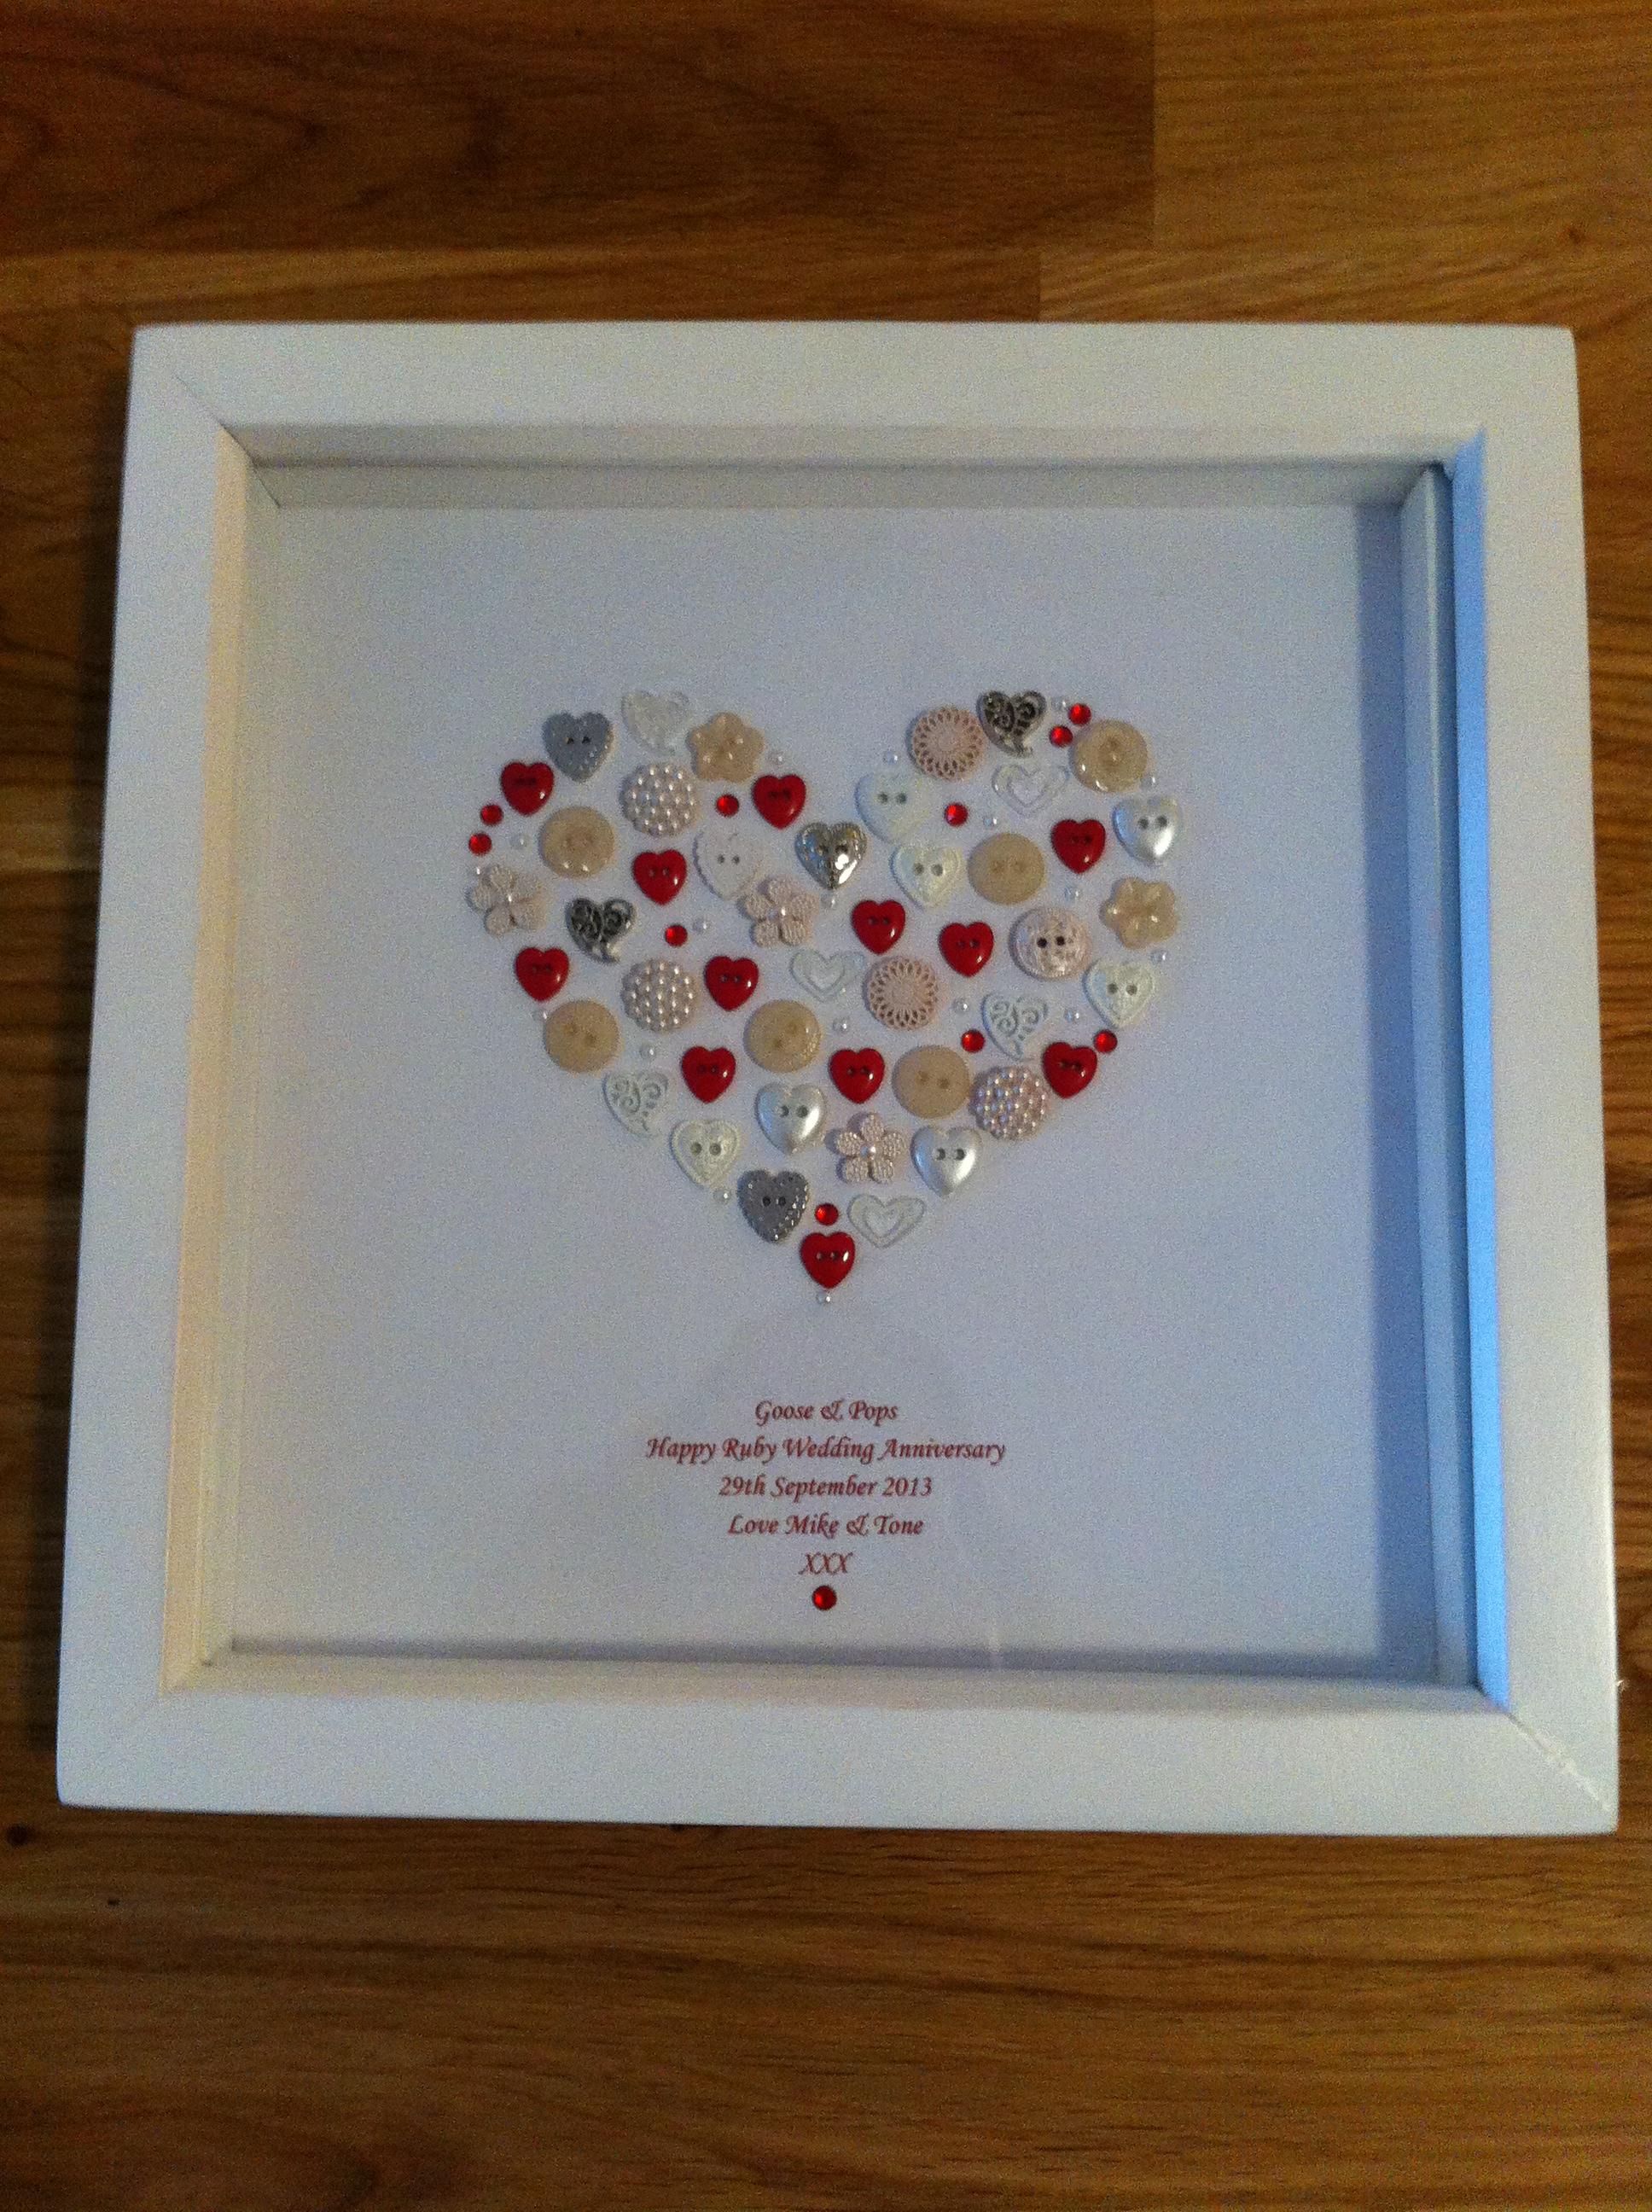 ruby wedding anniversary button frame tenderlovingcraft. Black Bedroom Furniture Sets. Home Design Ideas